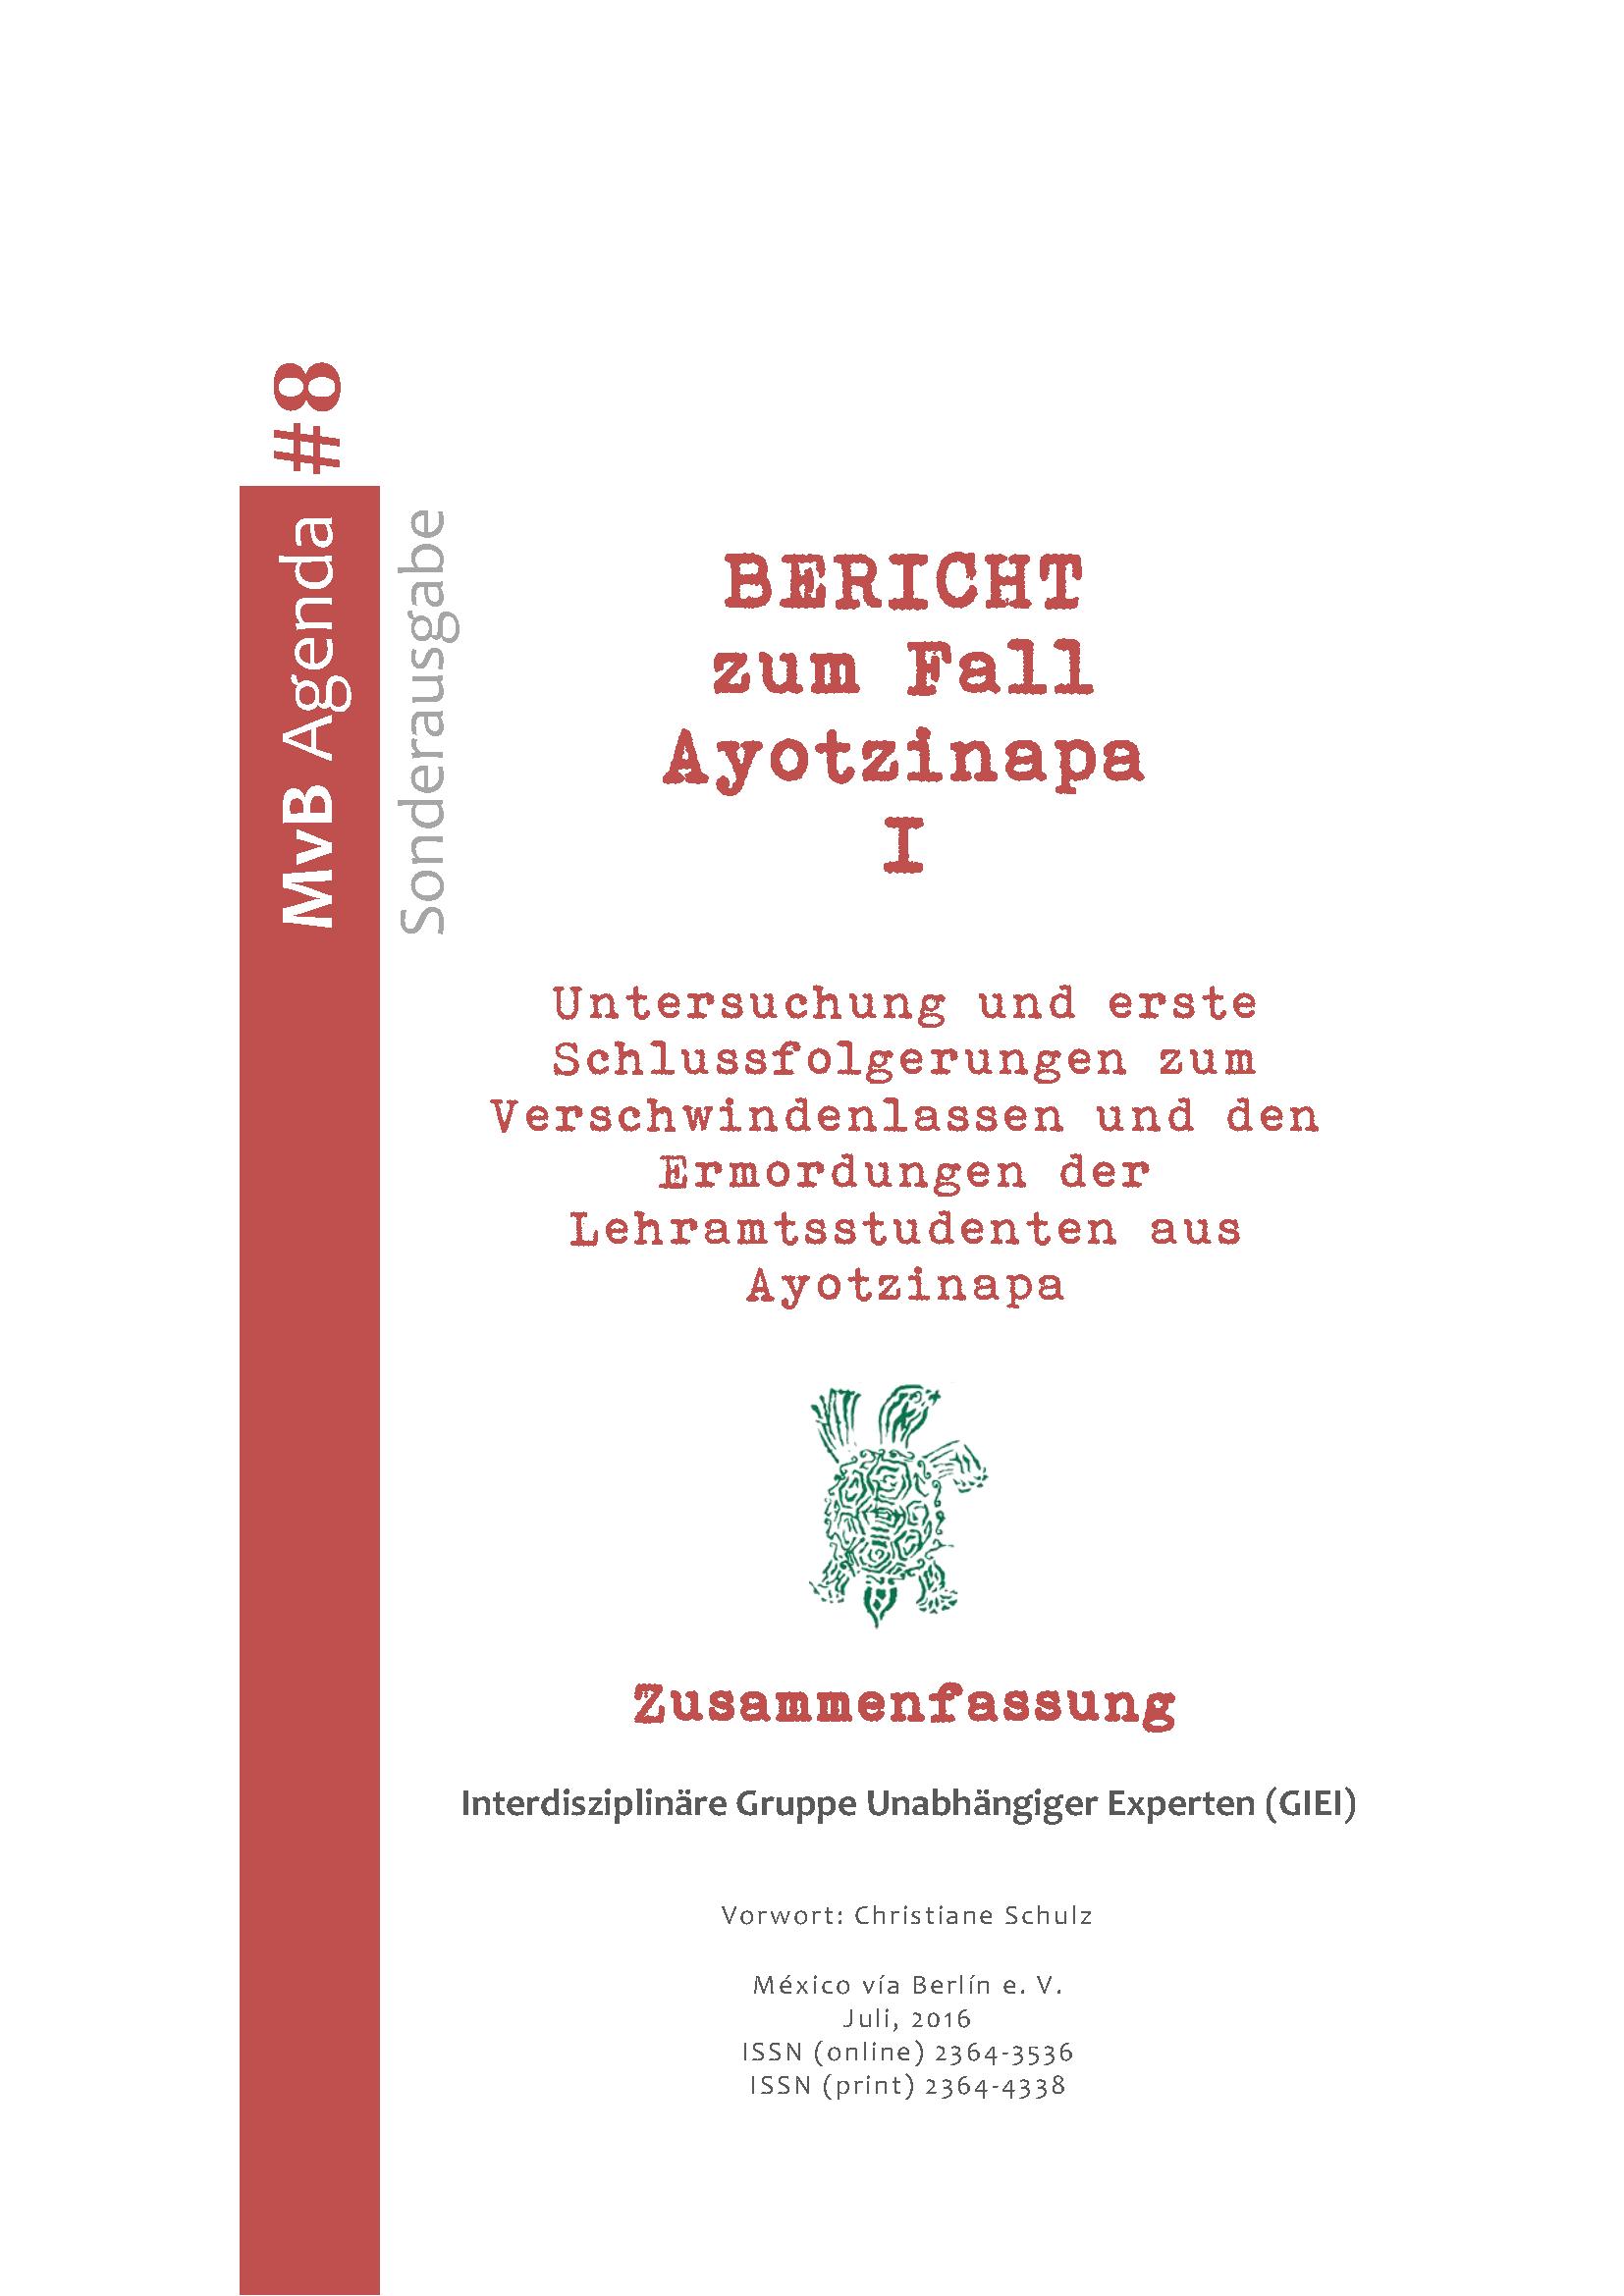 Bericht zum Fall Ayotzinapa GIEI Deutsch